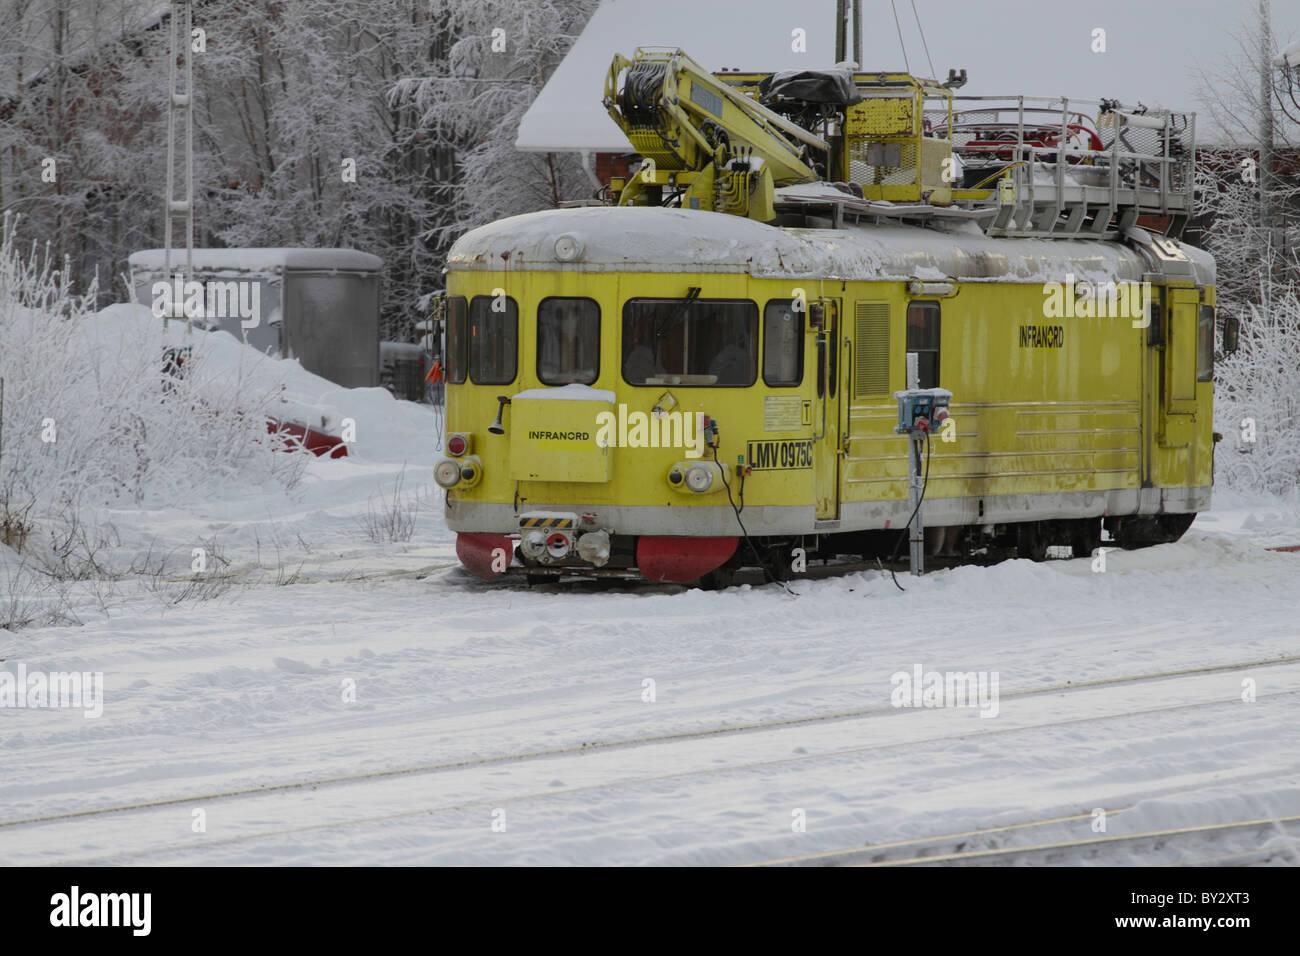 Railway maintenance vehicle in northern Sweden - Stock Image